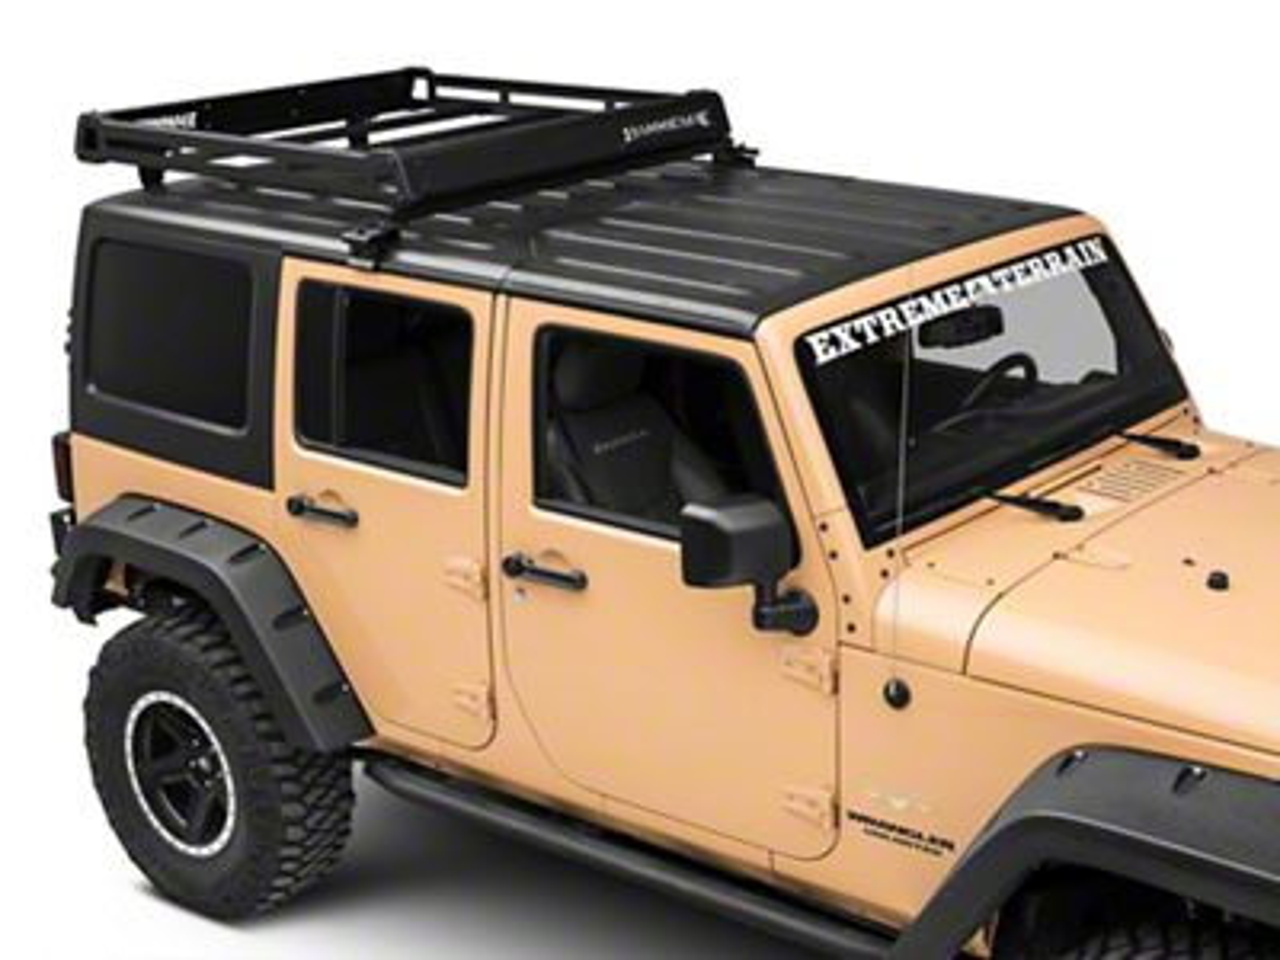 Barricade Jeep Wrangler Removable Hard Top Roof Basket J116279 07 18 Jeep Wrangler Jk